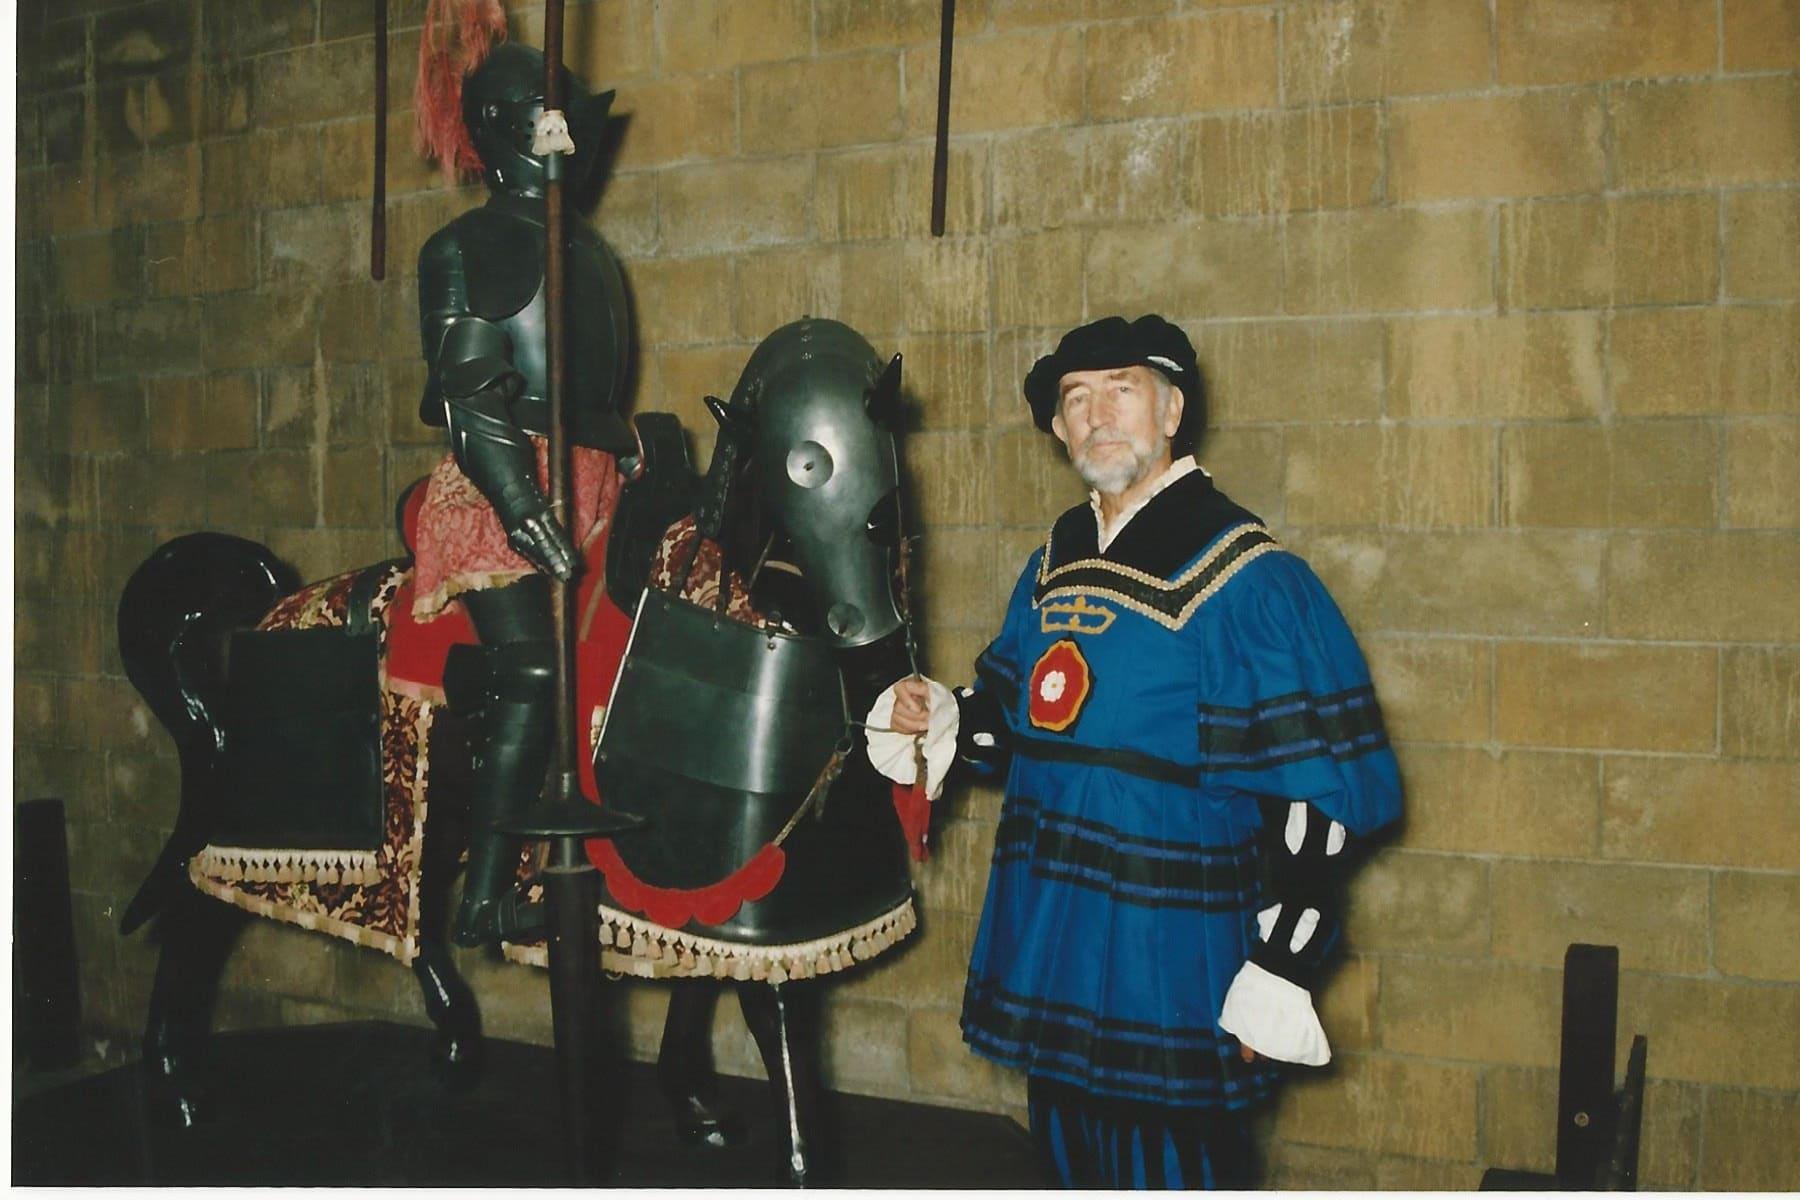 Yeomen of the Guard 19980005.jpg